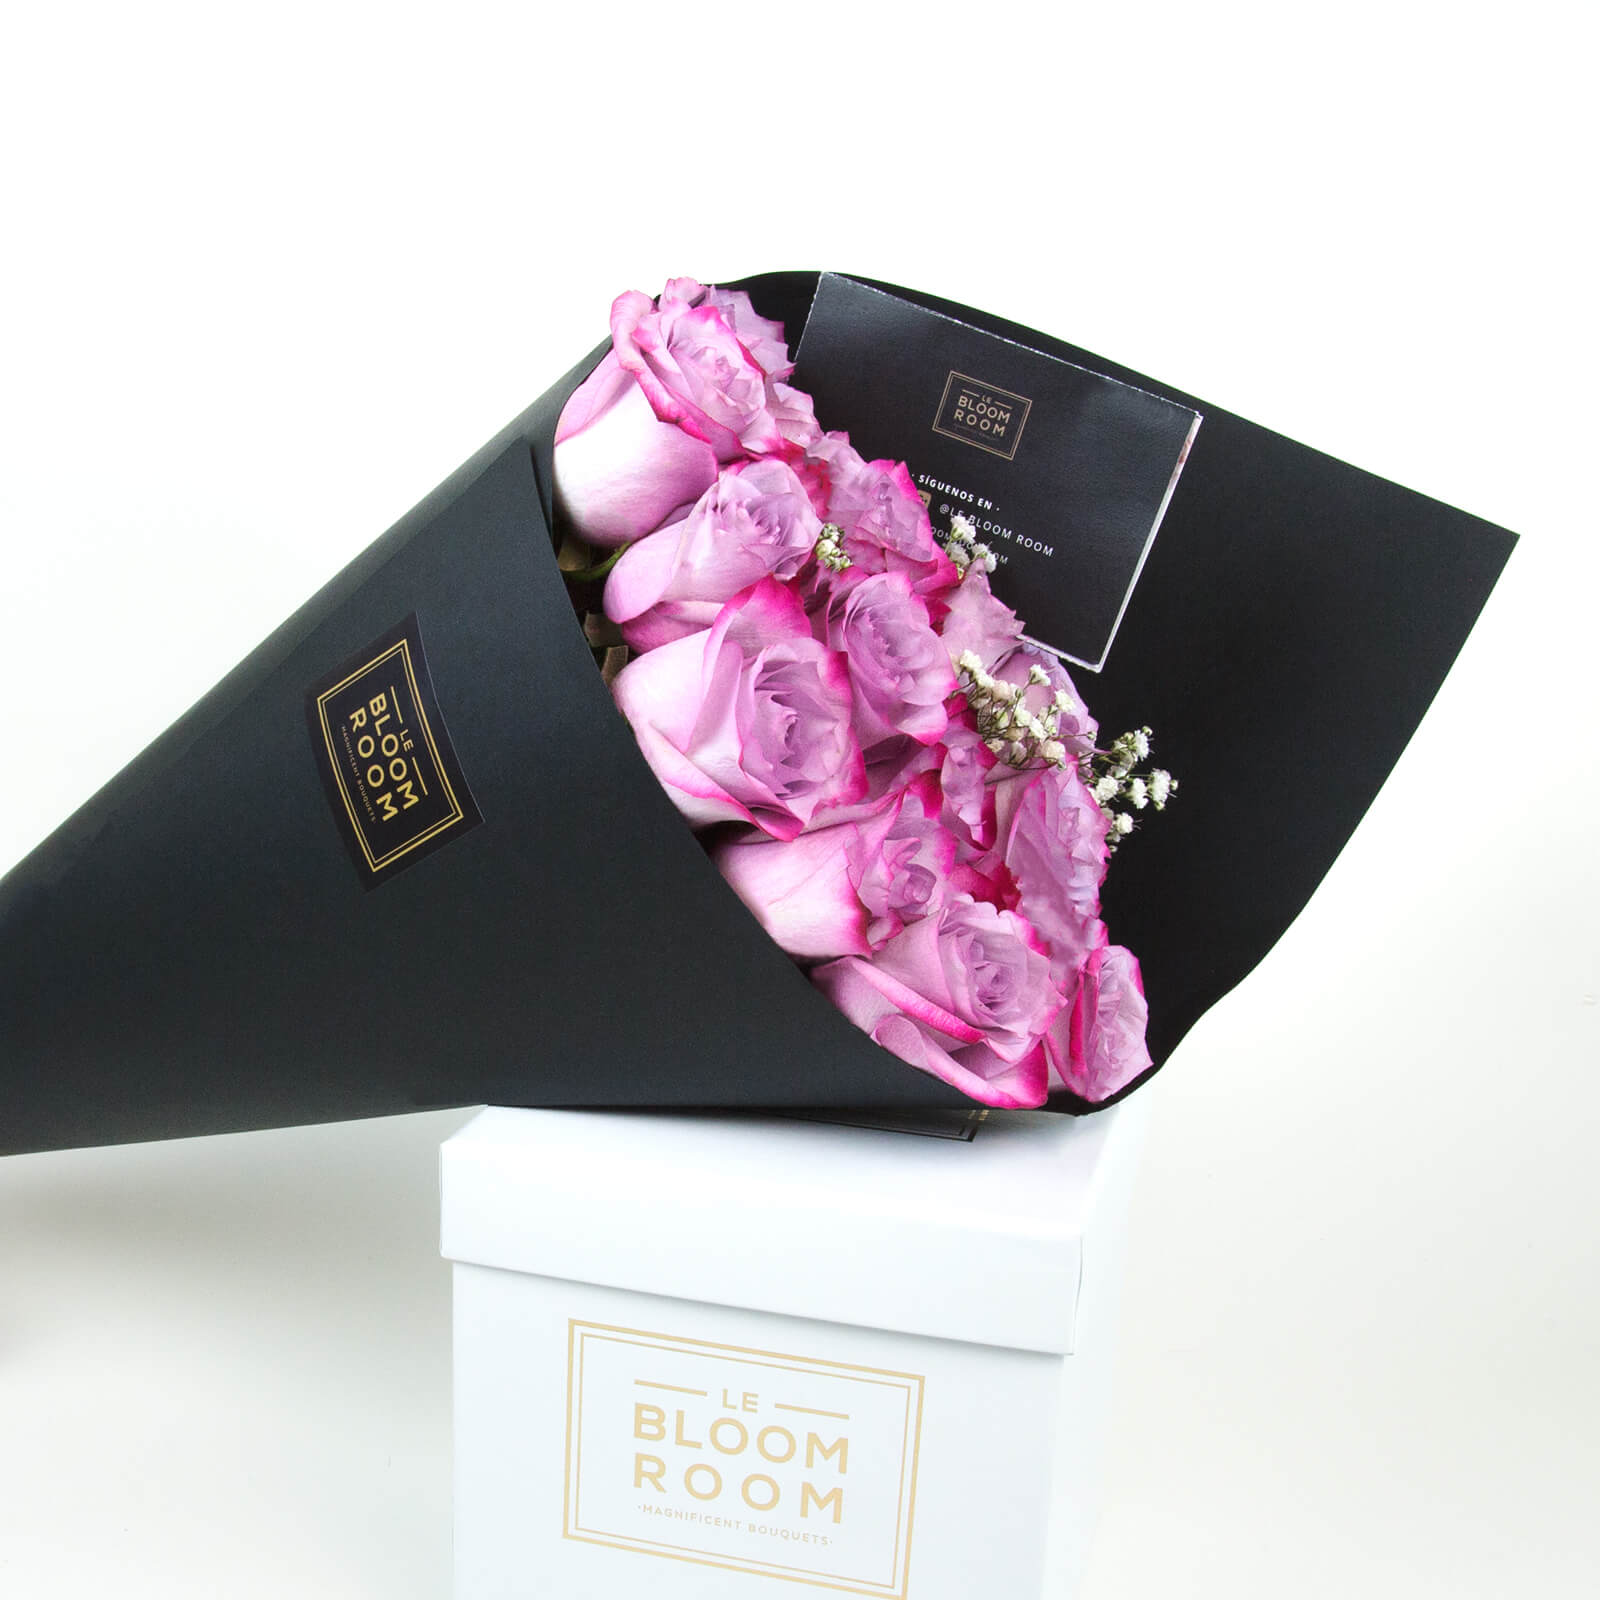 ramo de 24 rosas moradas en cono negro